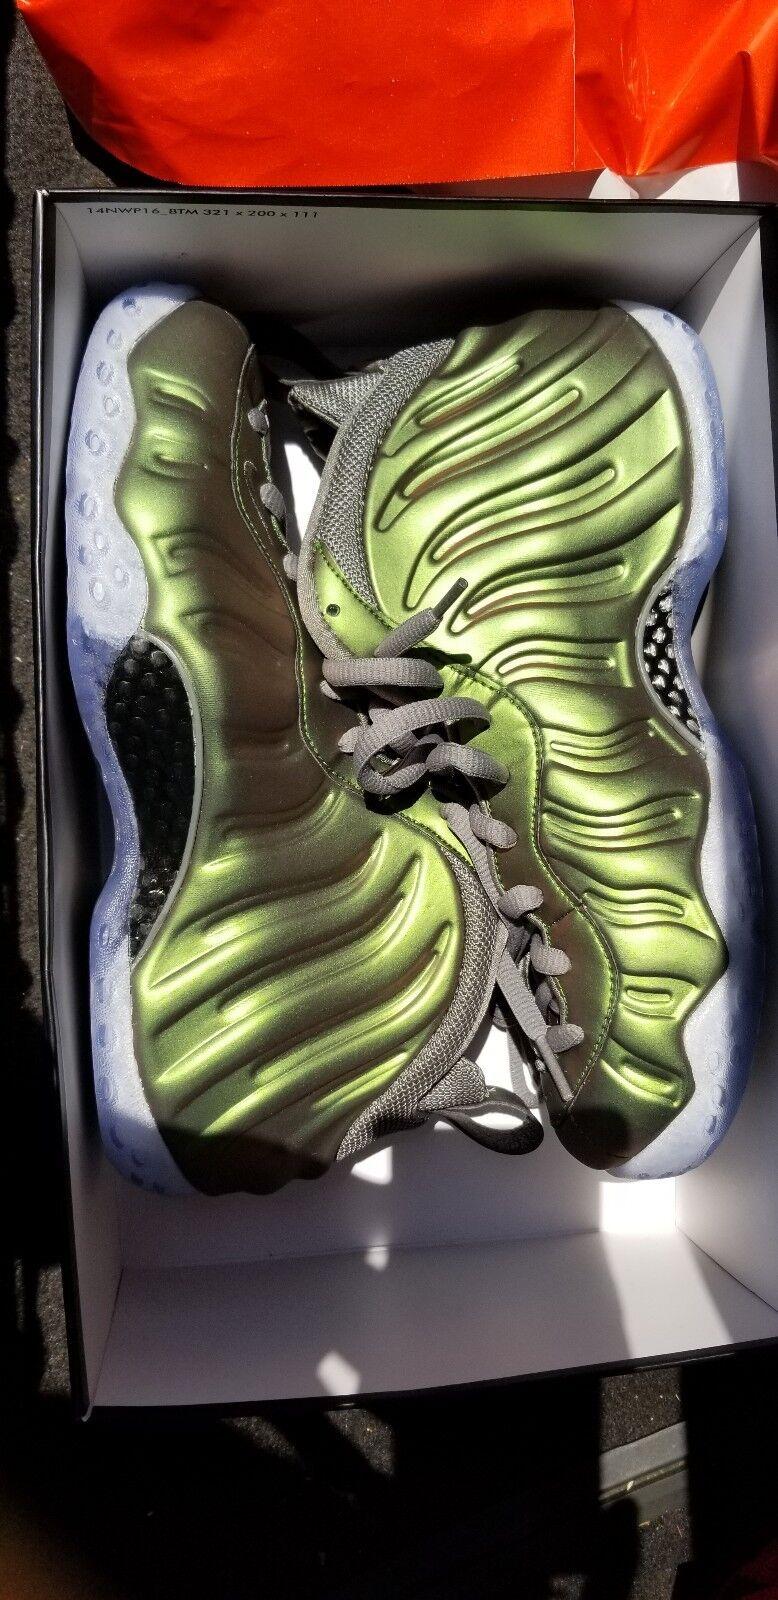 Nike Women's Air Foamposite One Dark Stucco/Dark Stucco/Basketball Shoe size 9 Wild casual shoes